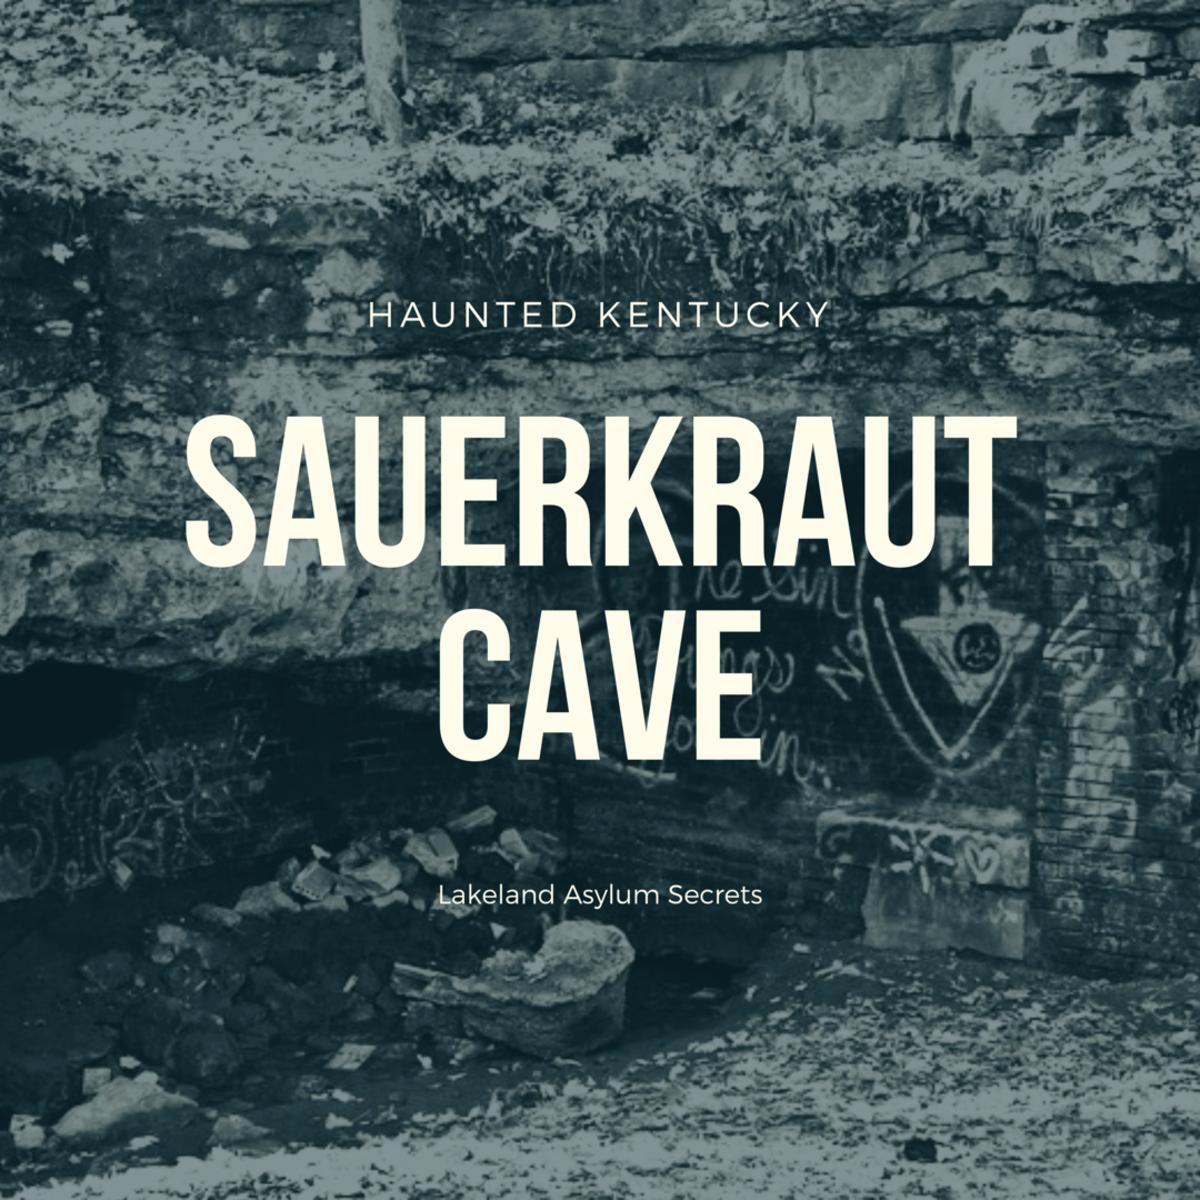 Haunted Kentucky: Sauerkraut Cave and the History of Lakeland Asylum